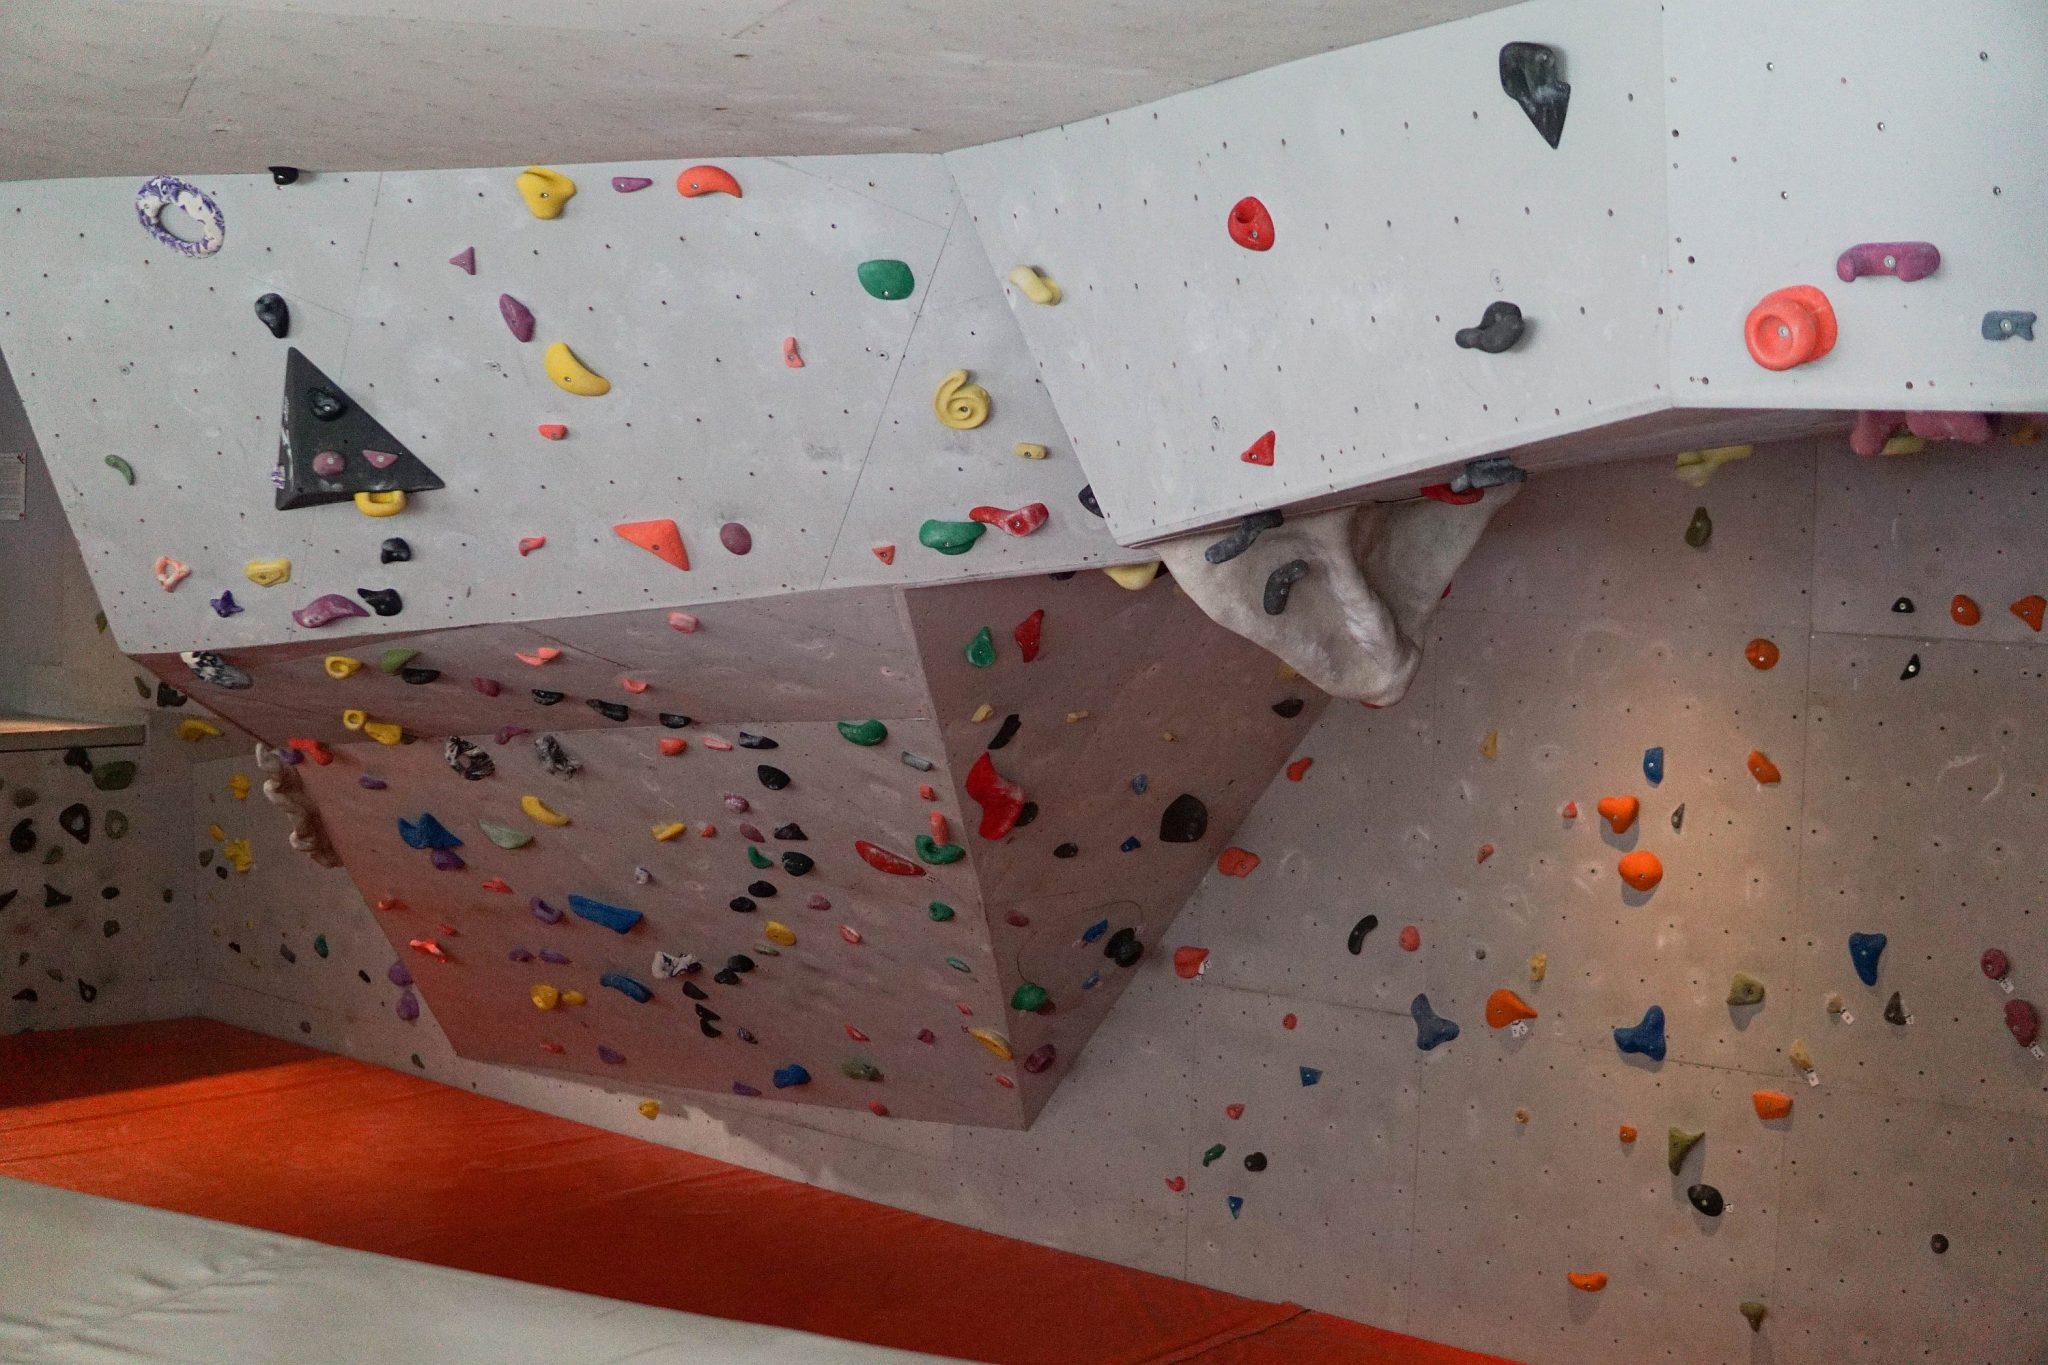 Die Boulderwand im Alpinarium | Climbers Paradise